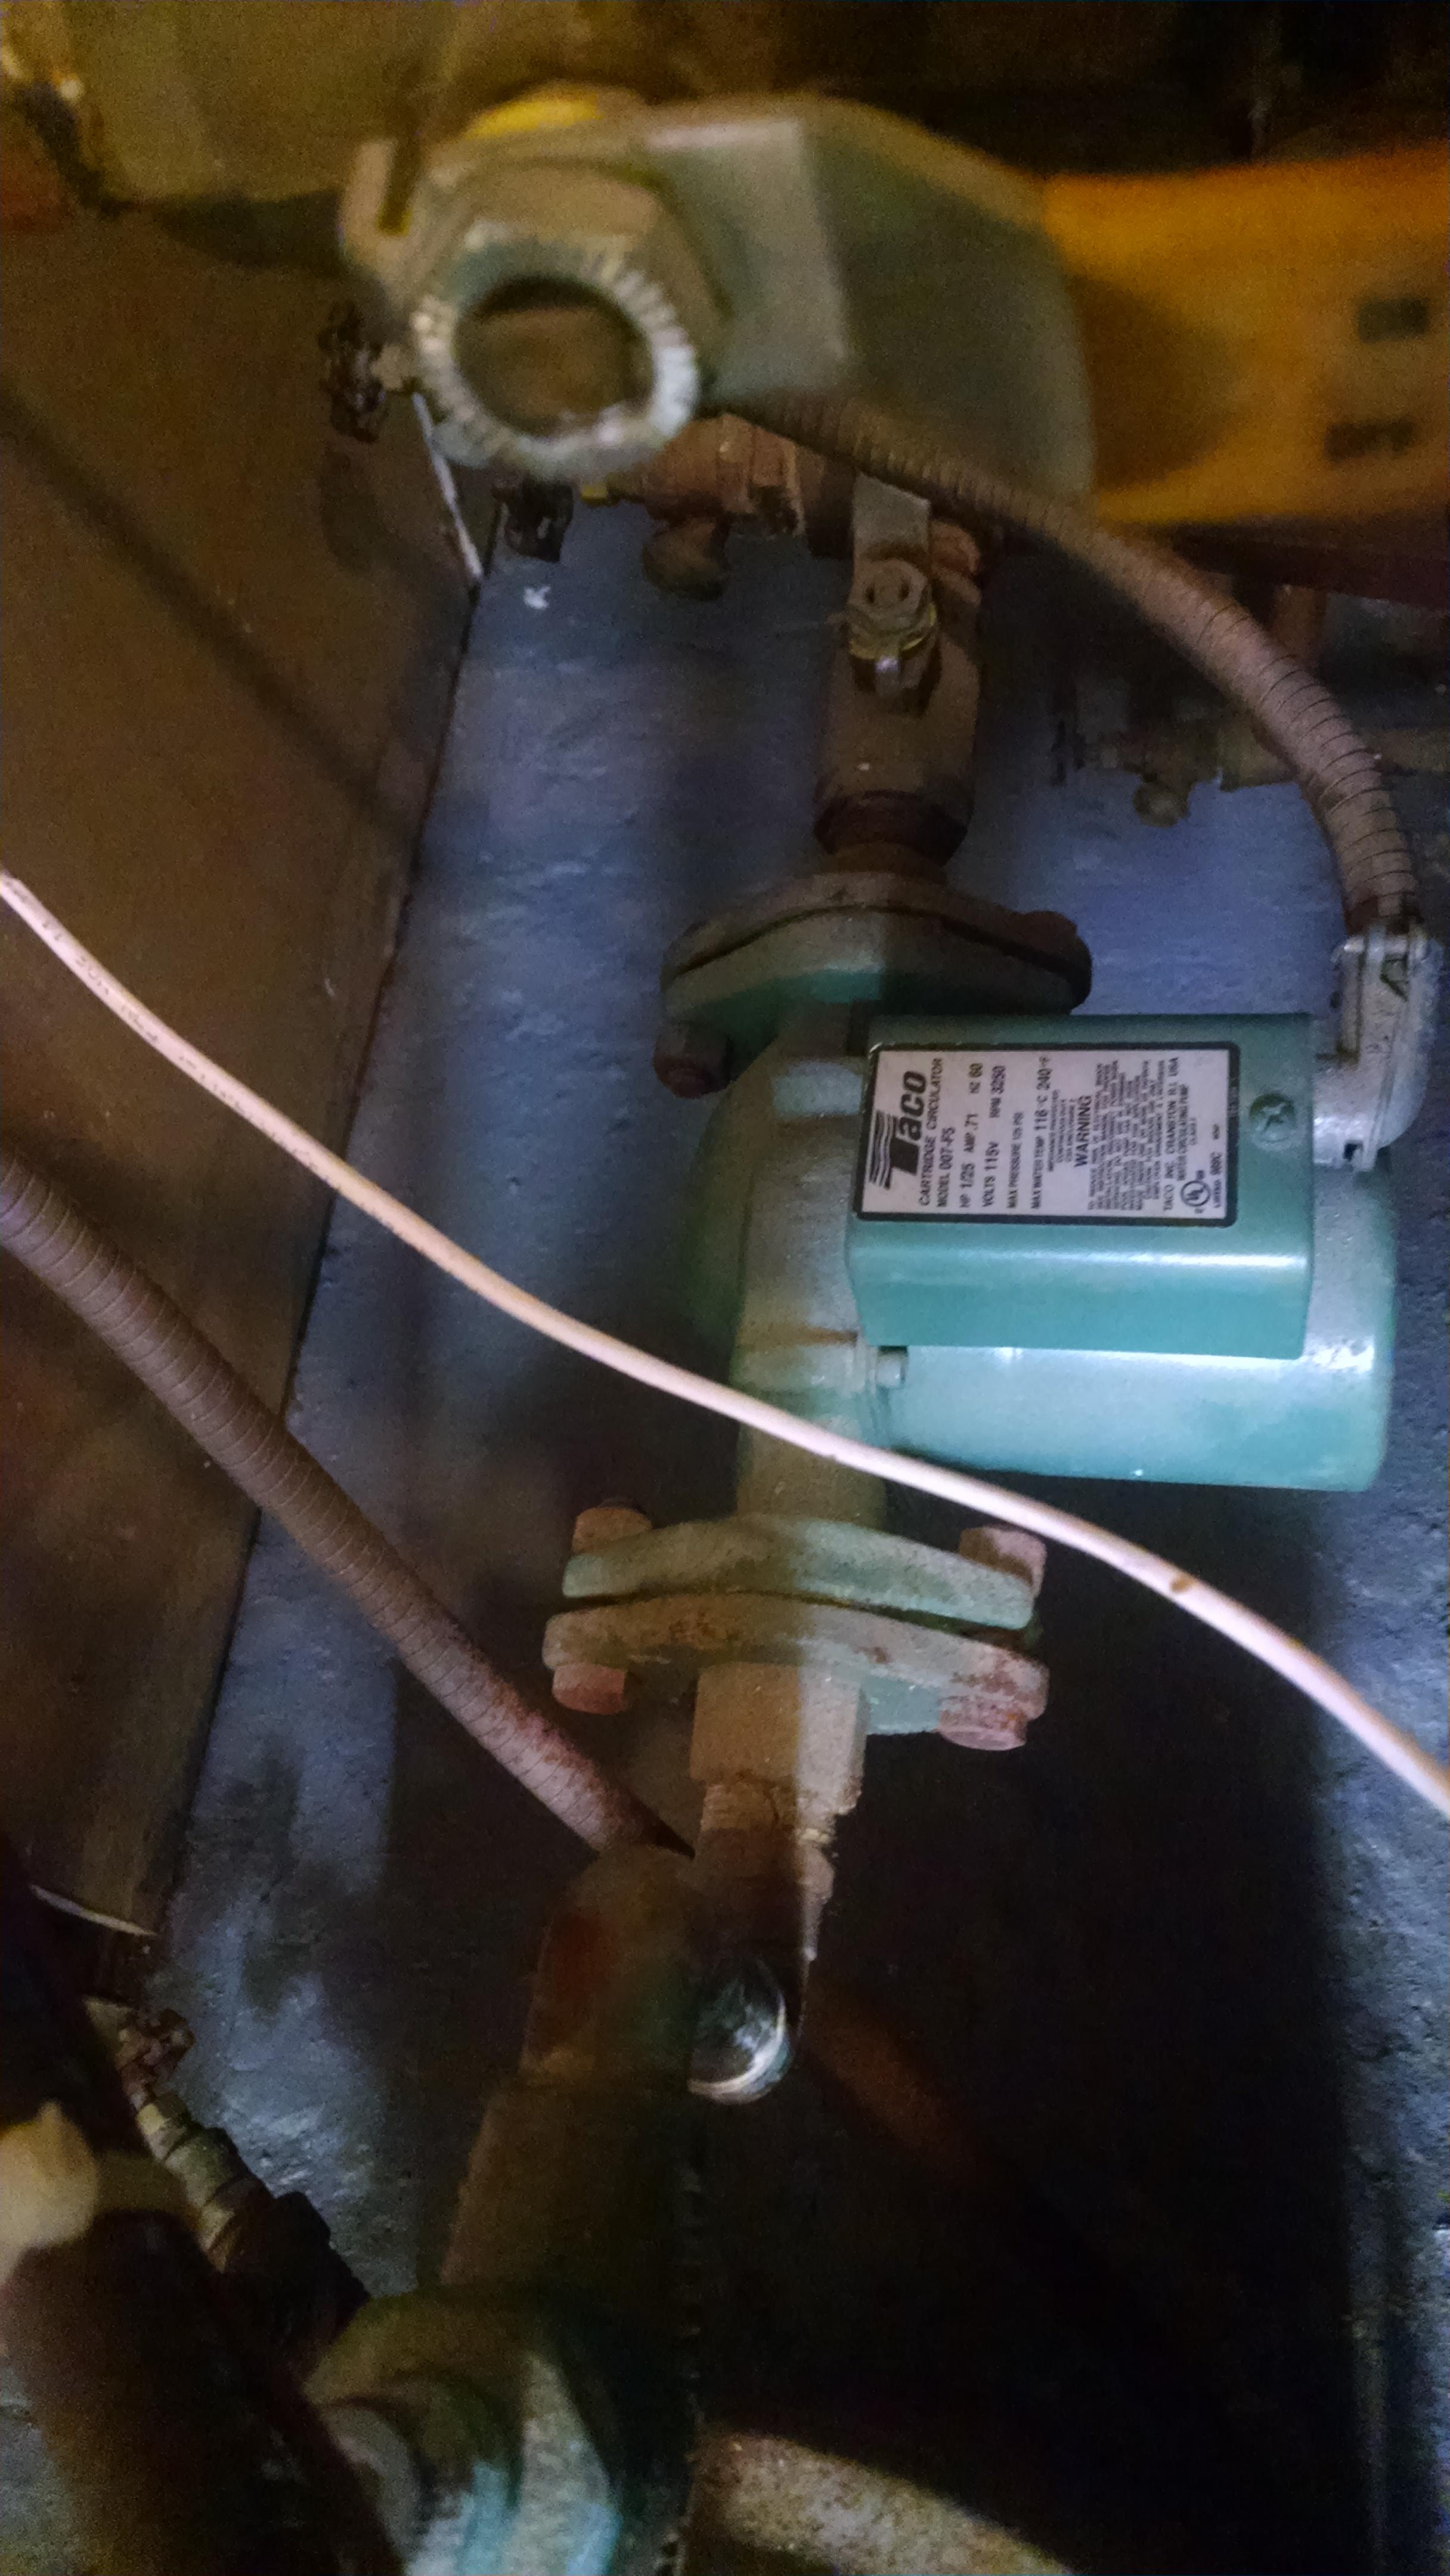 Is My Hot Water Loop Wrong Heating Help The Wall Taco Circulator Wiring 007 F4 Img 20141002 204752257 23m